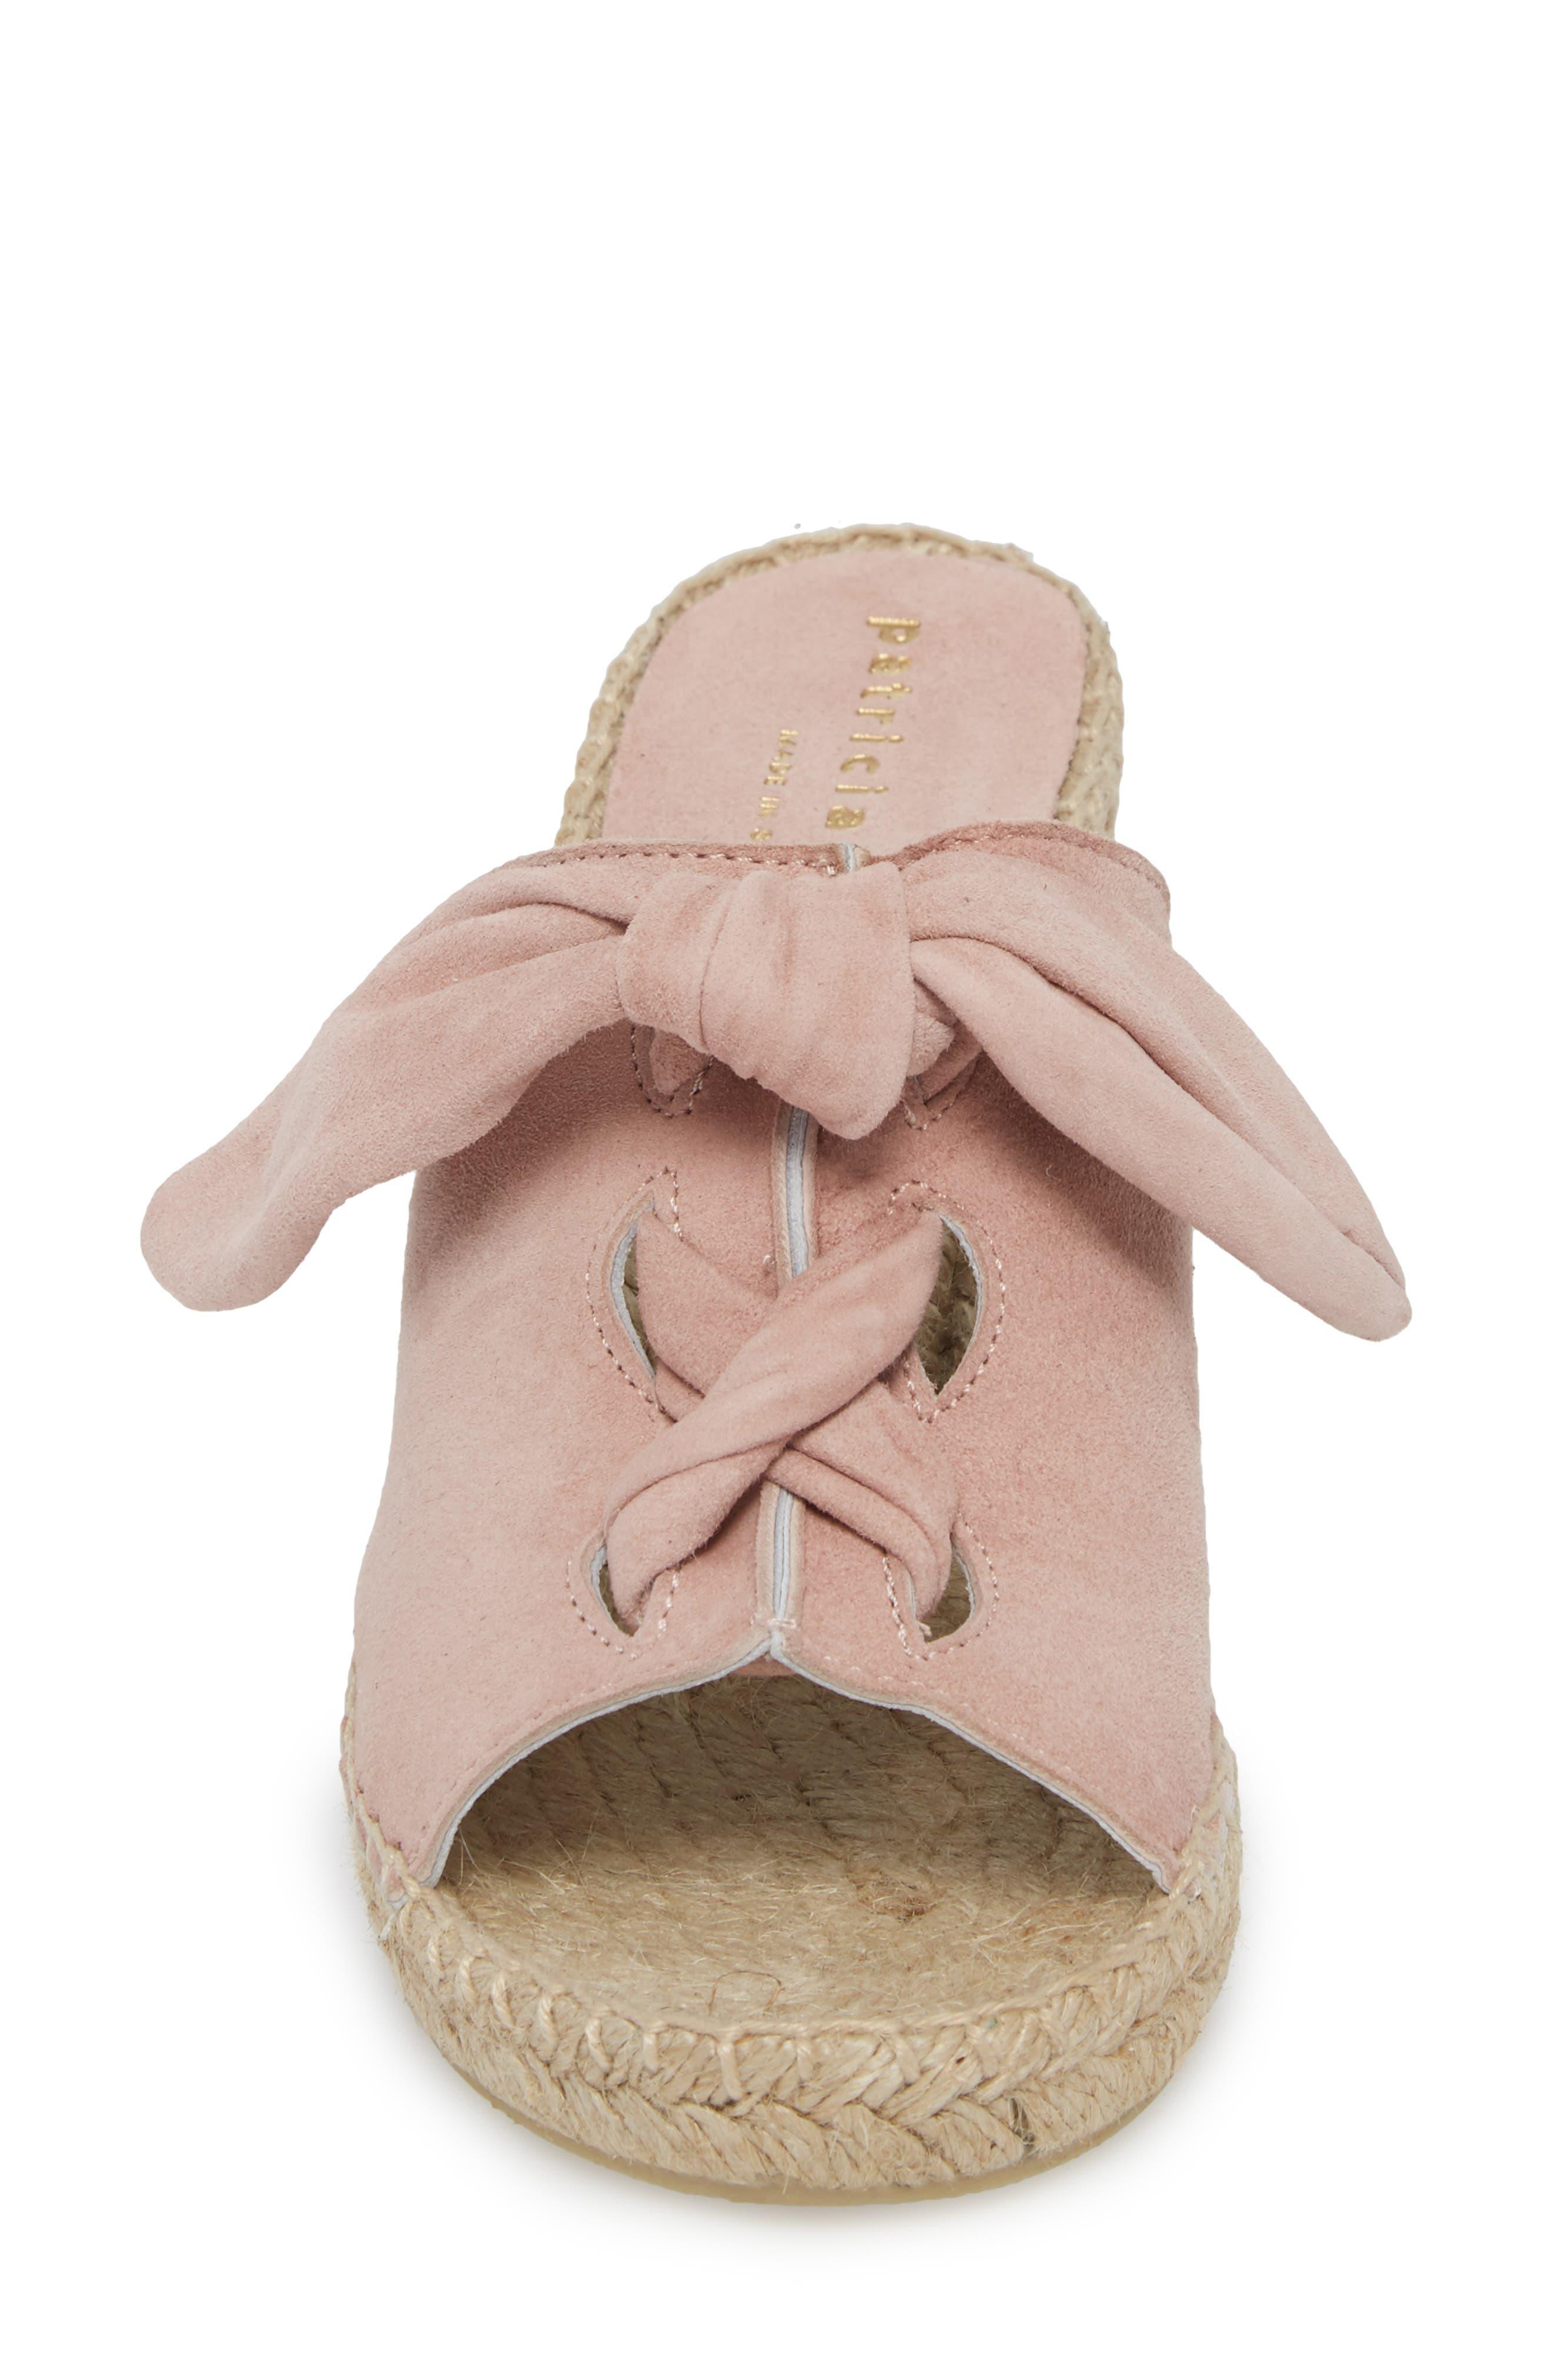 Flirt Espadrille Wedge Sandal,                             Alternate thumbnail 4, color,                             Pink Suede